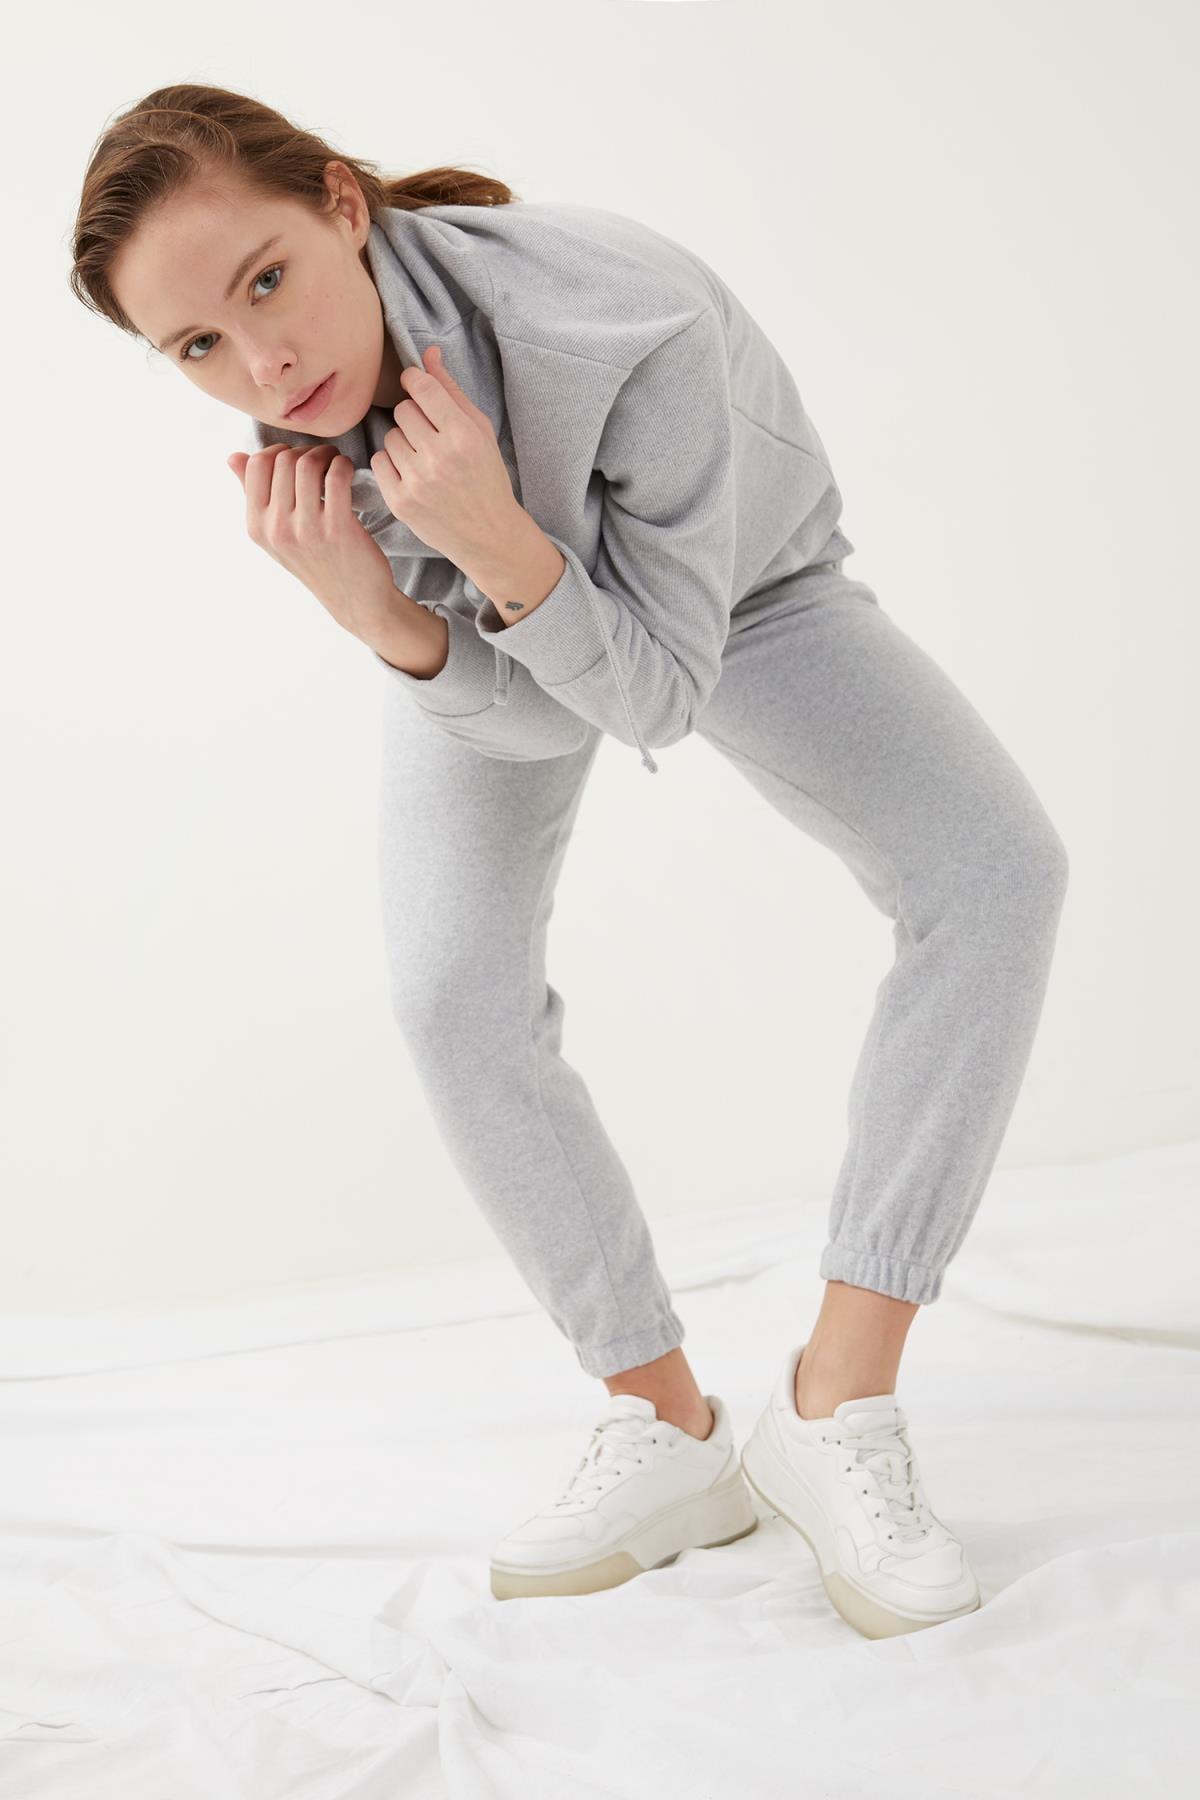 Defacto Kadın Gri Bağcıklı Relax Fit Jogger Eşofman Altı